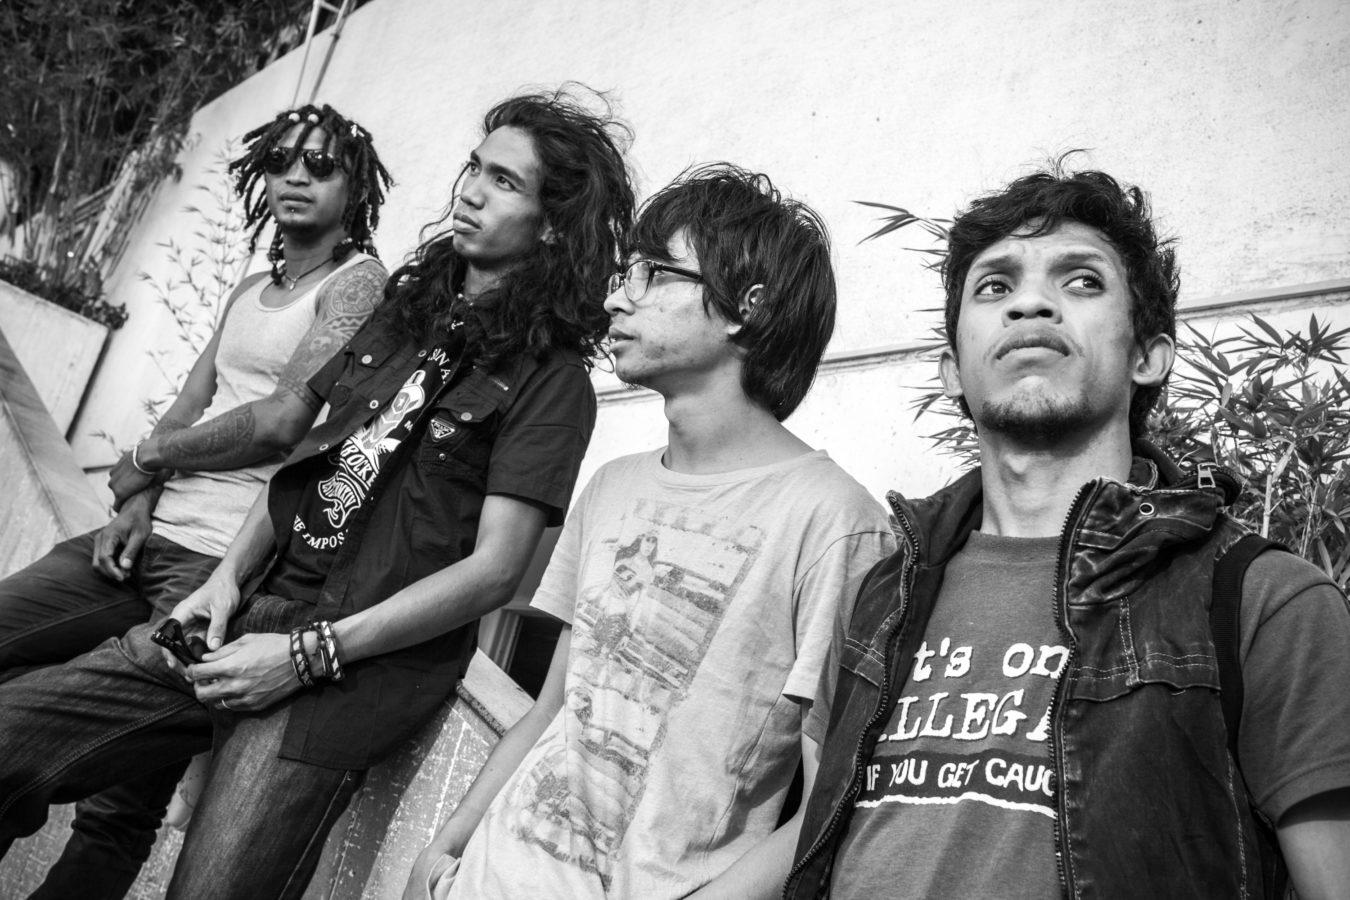 13/10/2015 - Antananarivo, MADAGASCAR - Le groupe THE DIZZY BRAINS. PHOTO : © RIJASOLO